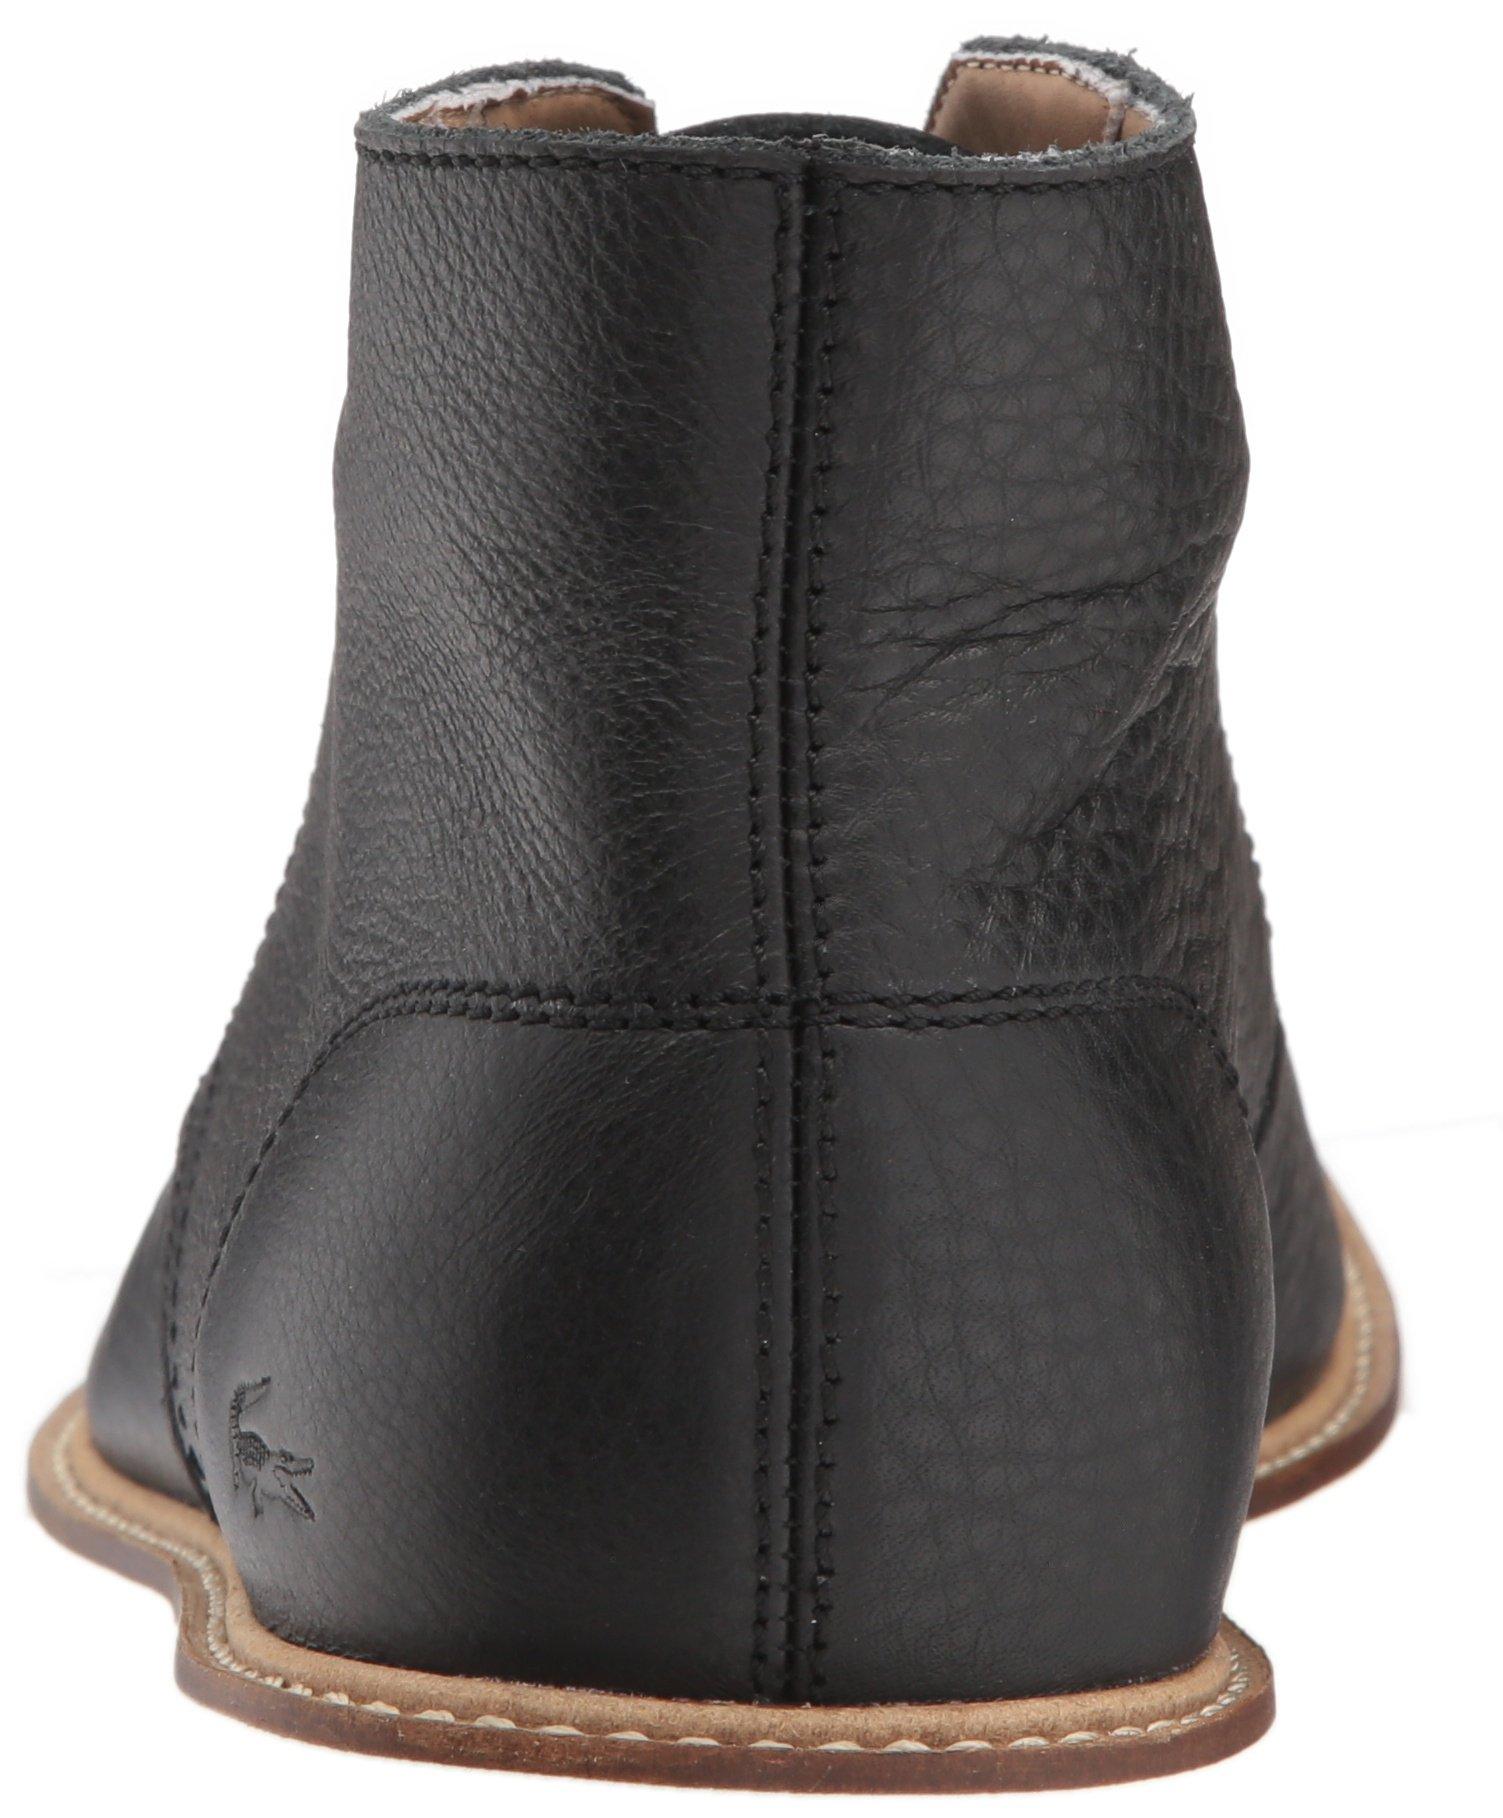 430a7e380 Lacoste Men s Sherbrooke Boots   Chukka   Clothing